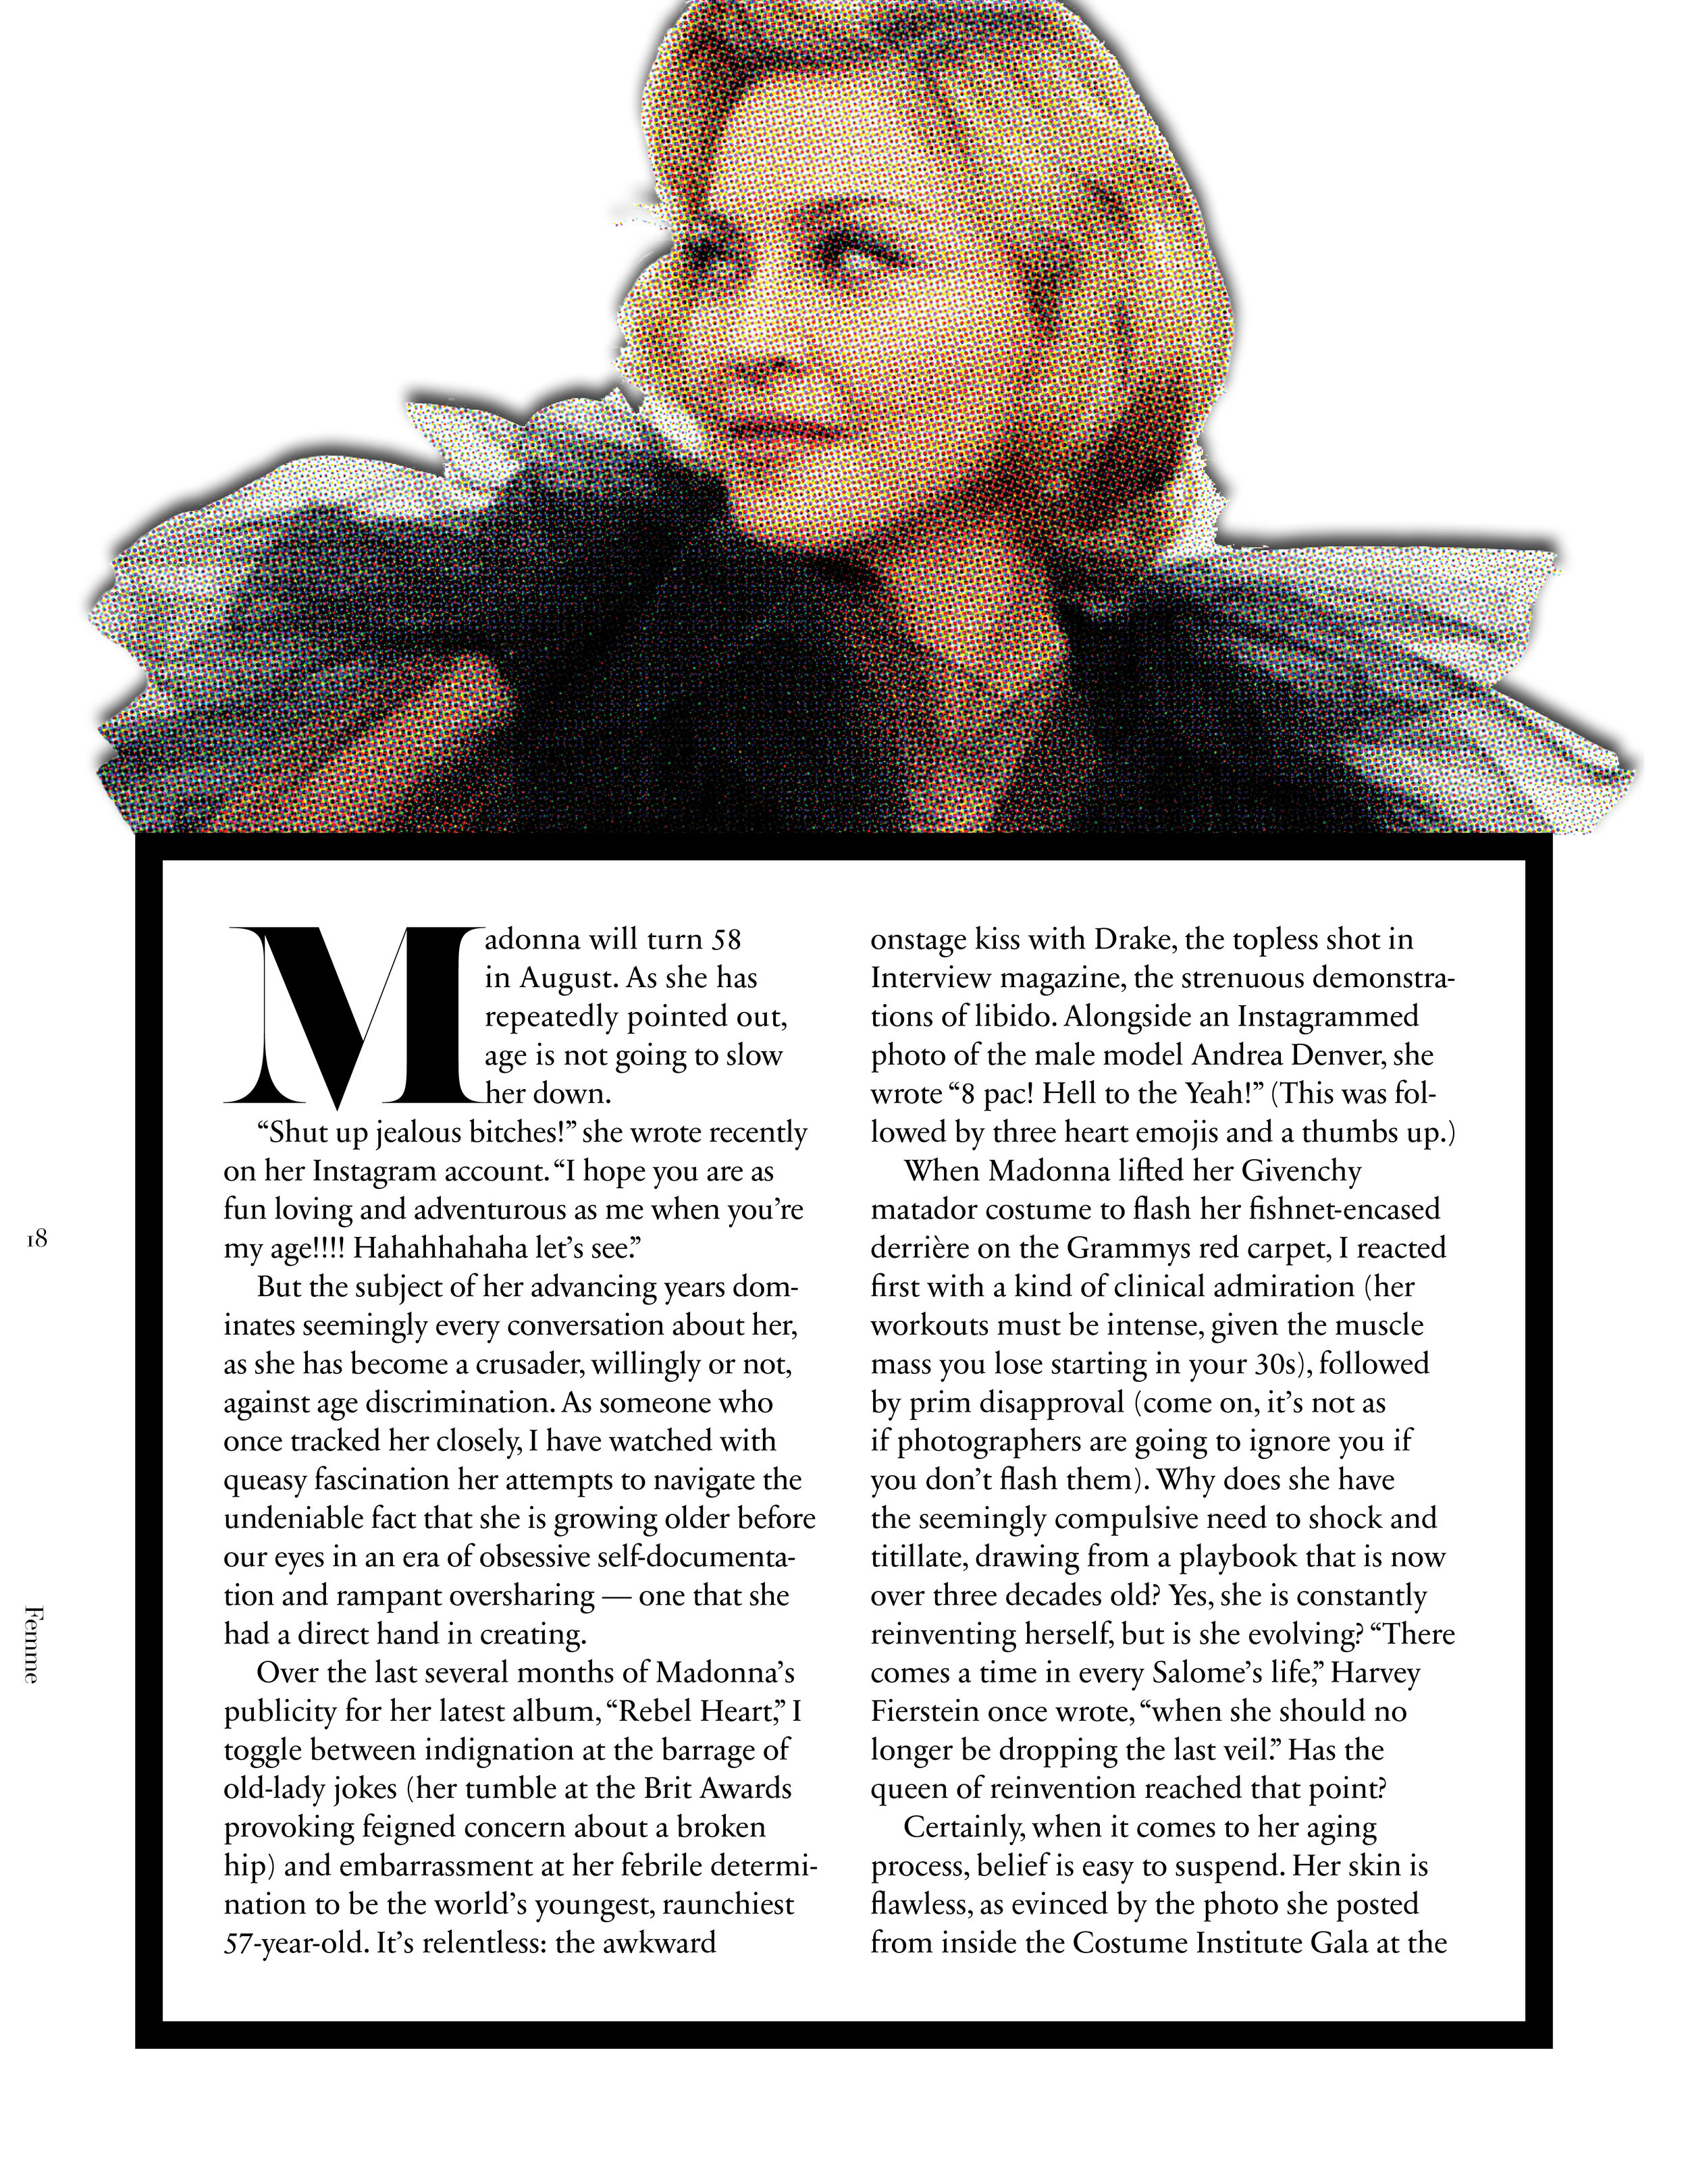 Madonna Article4.jpg